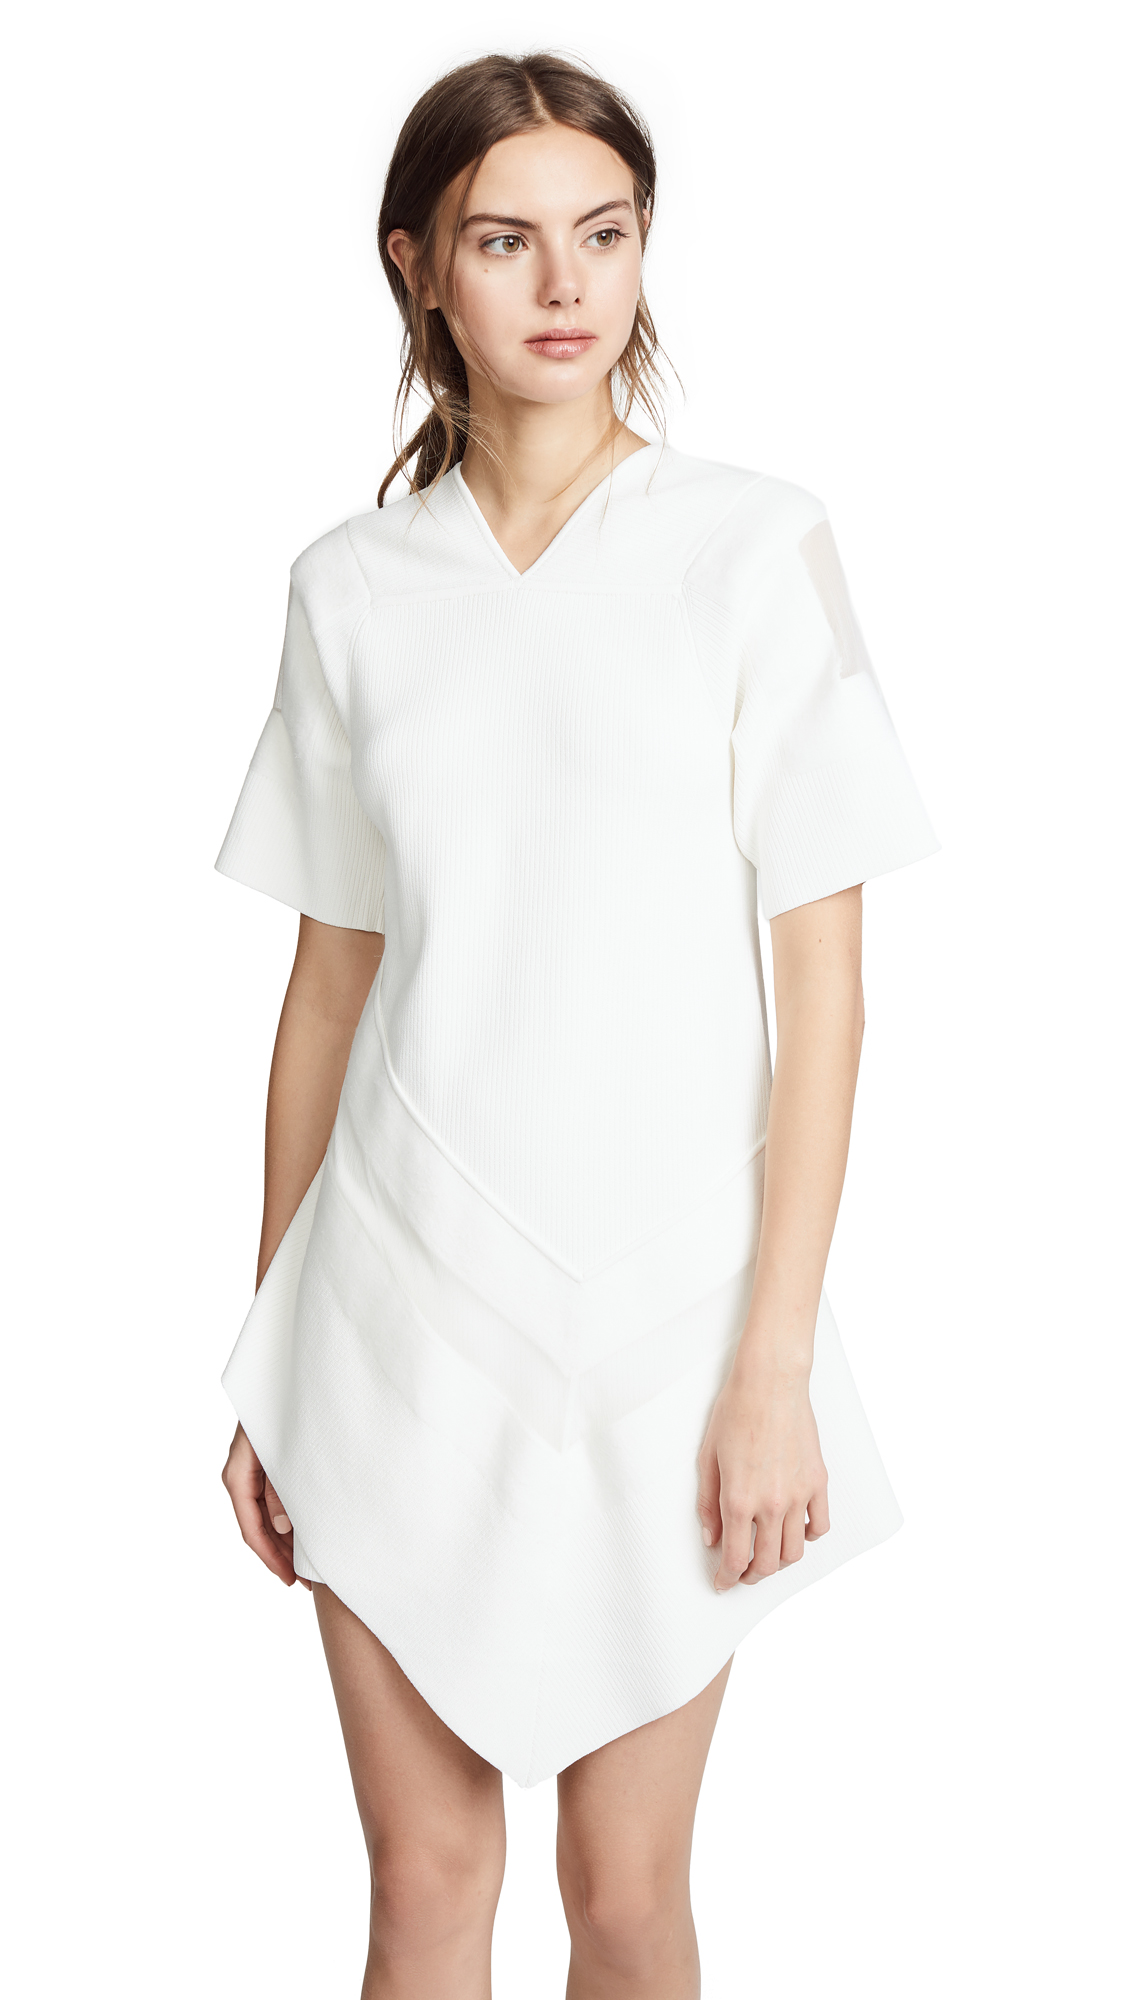 3.1 Phillip Lim Needle Punch Handkerchief Dress